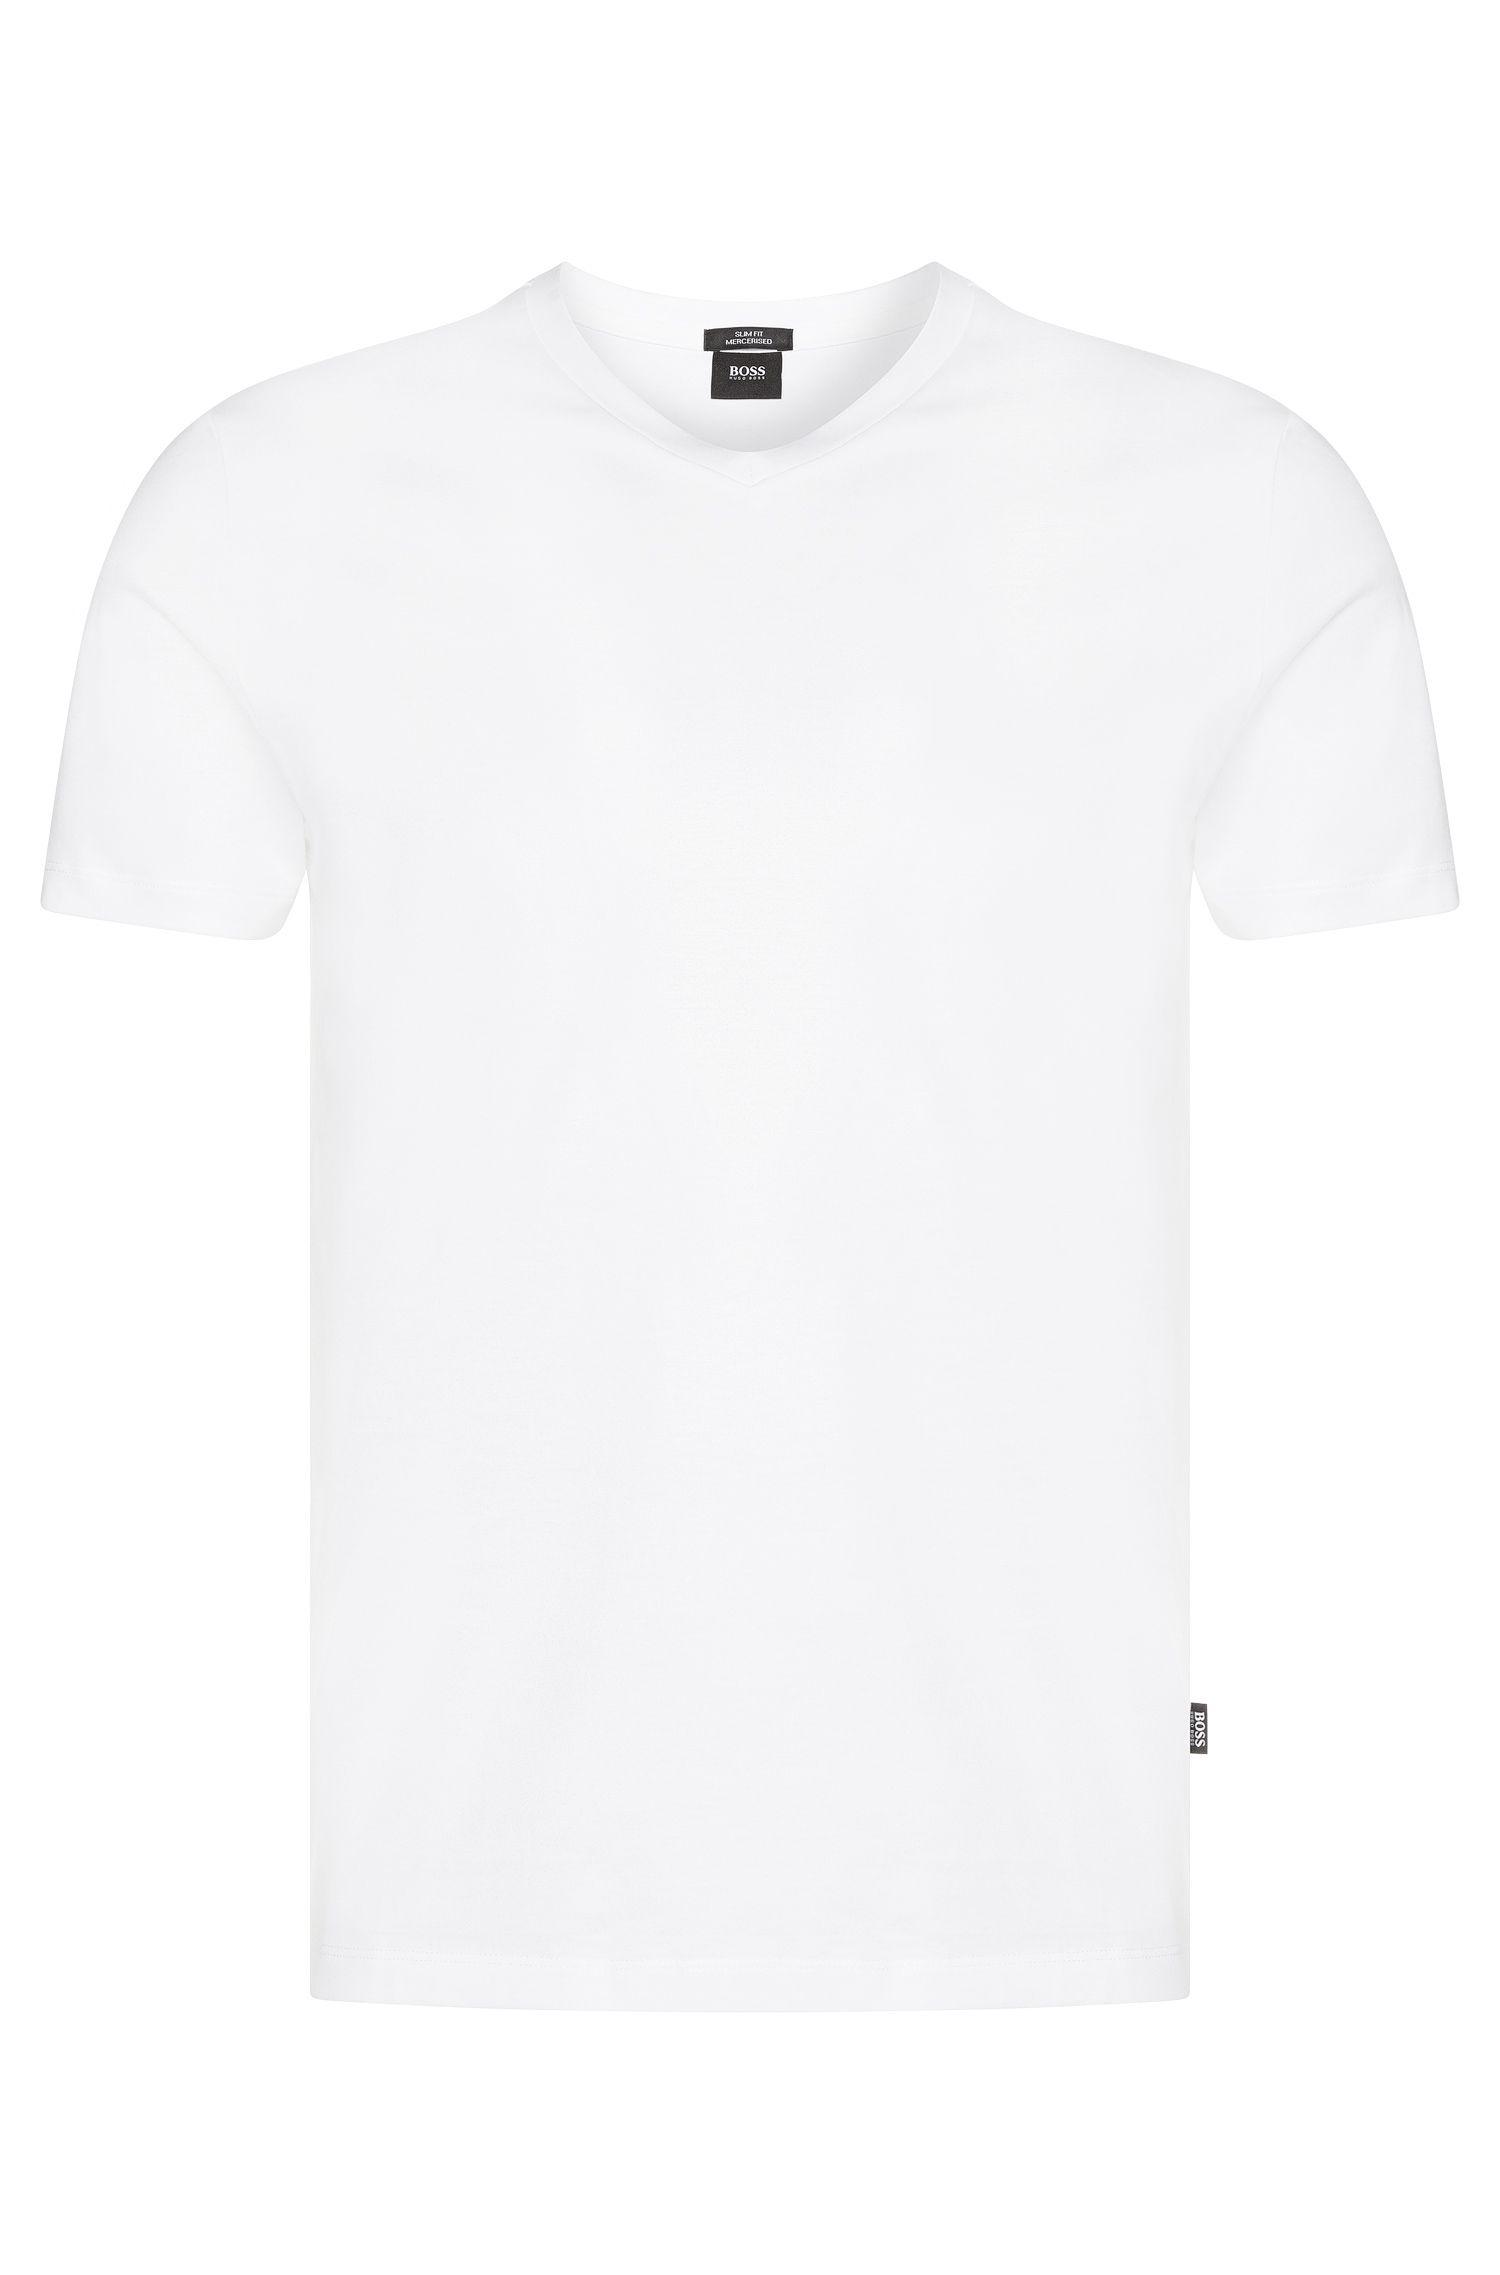 Unifarbenes Slim-Fit T-Shirt mit V-Ausschnitt: 'Teal 14'